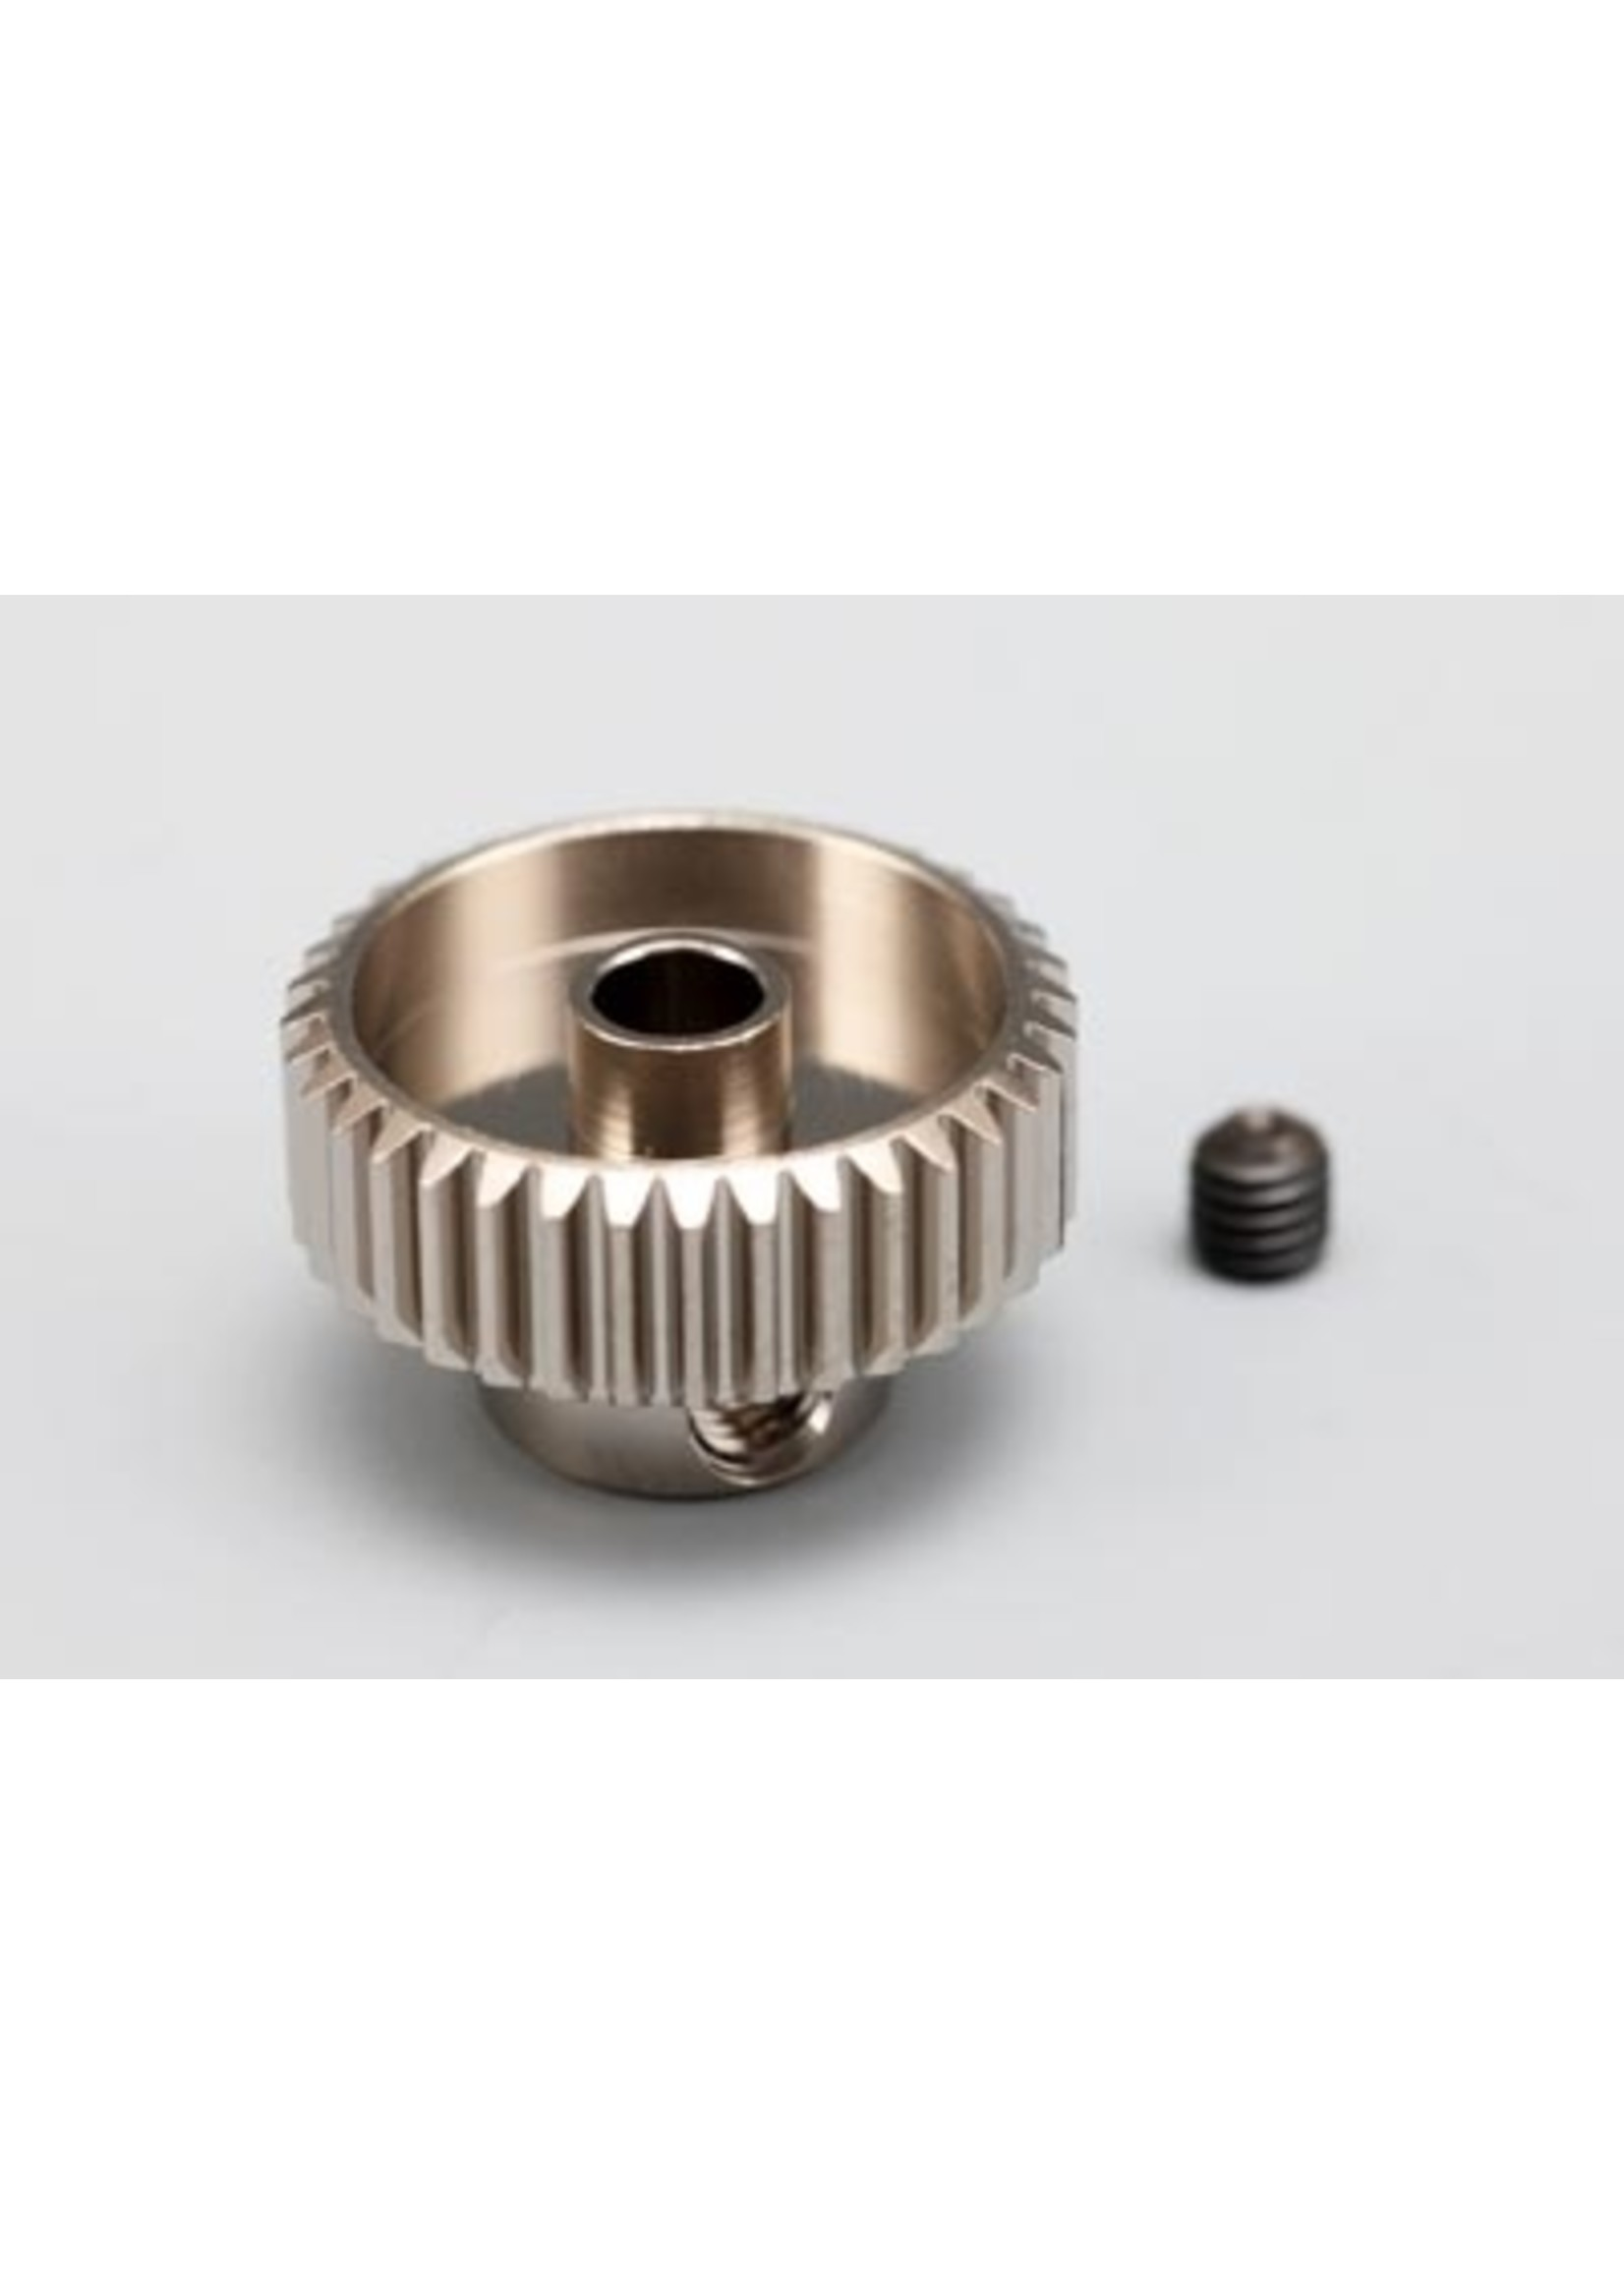 Yokomo Yokomo 30T Hard Precision Pinion Gear (64Pitch·Light Weight) PG-6430